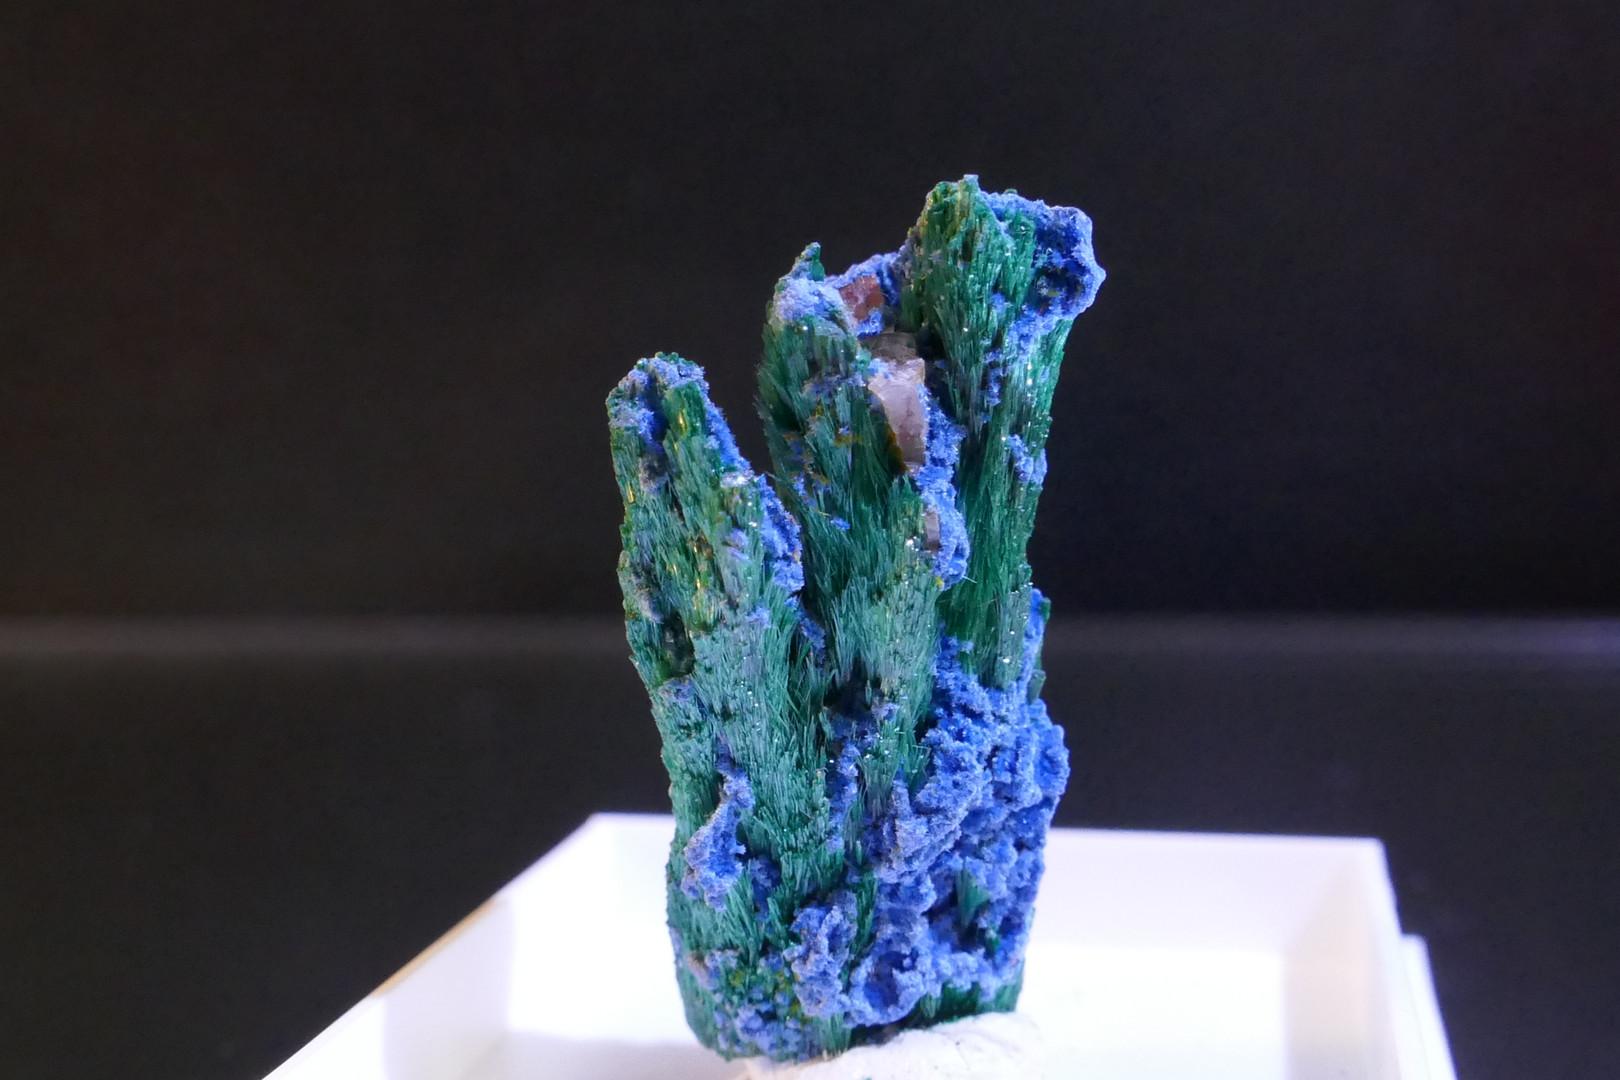 Malachite, Shattuckite, and Wulfunite